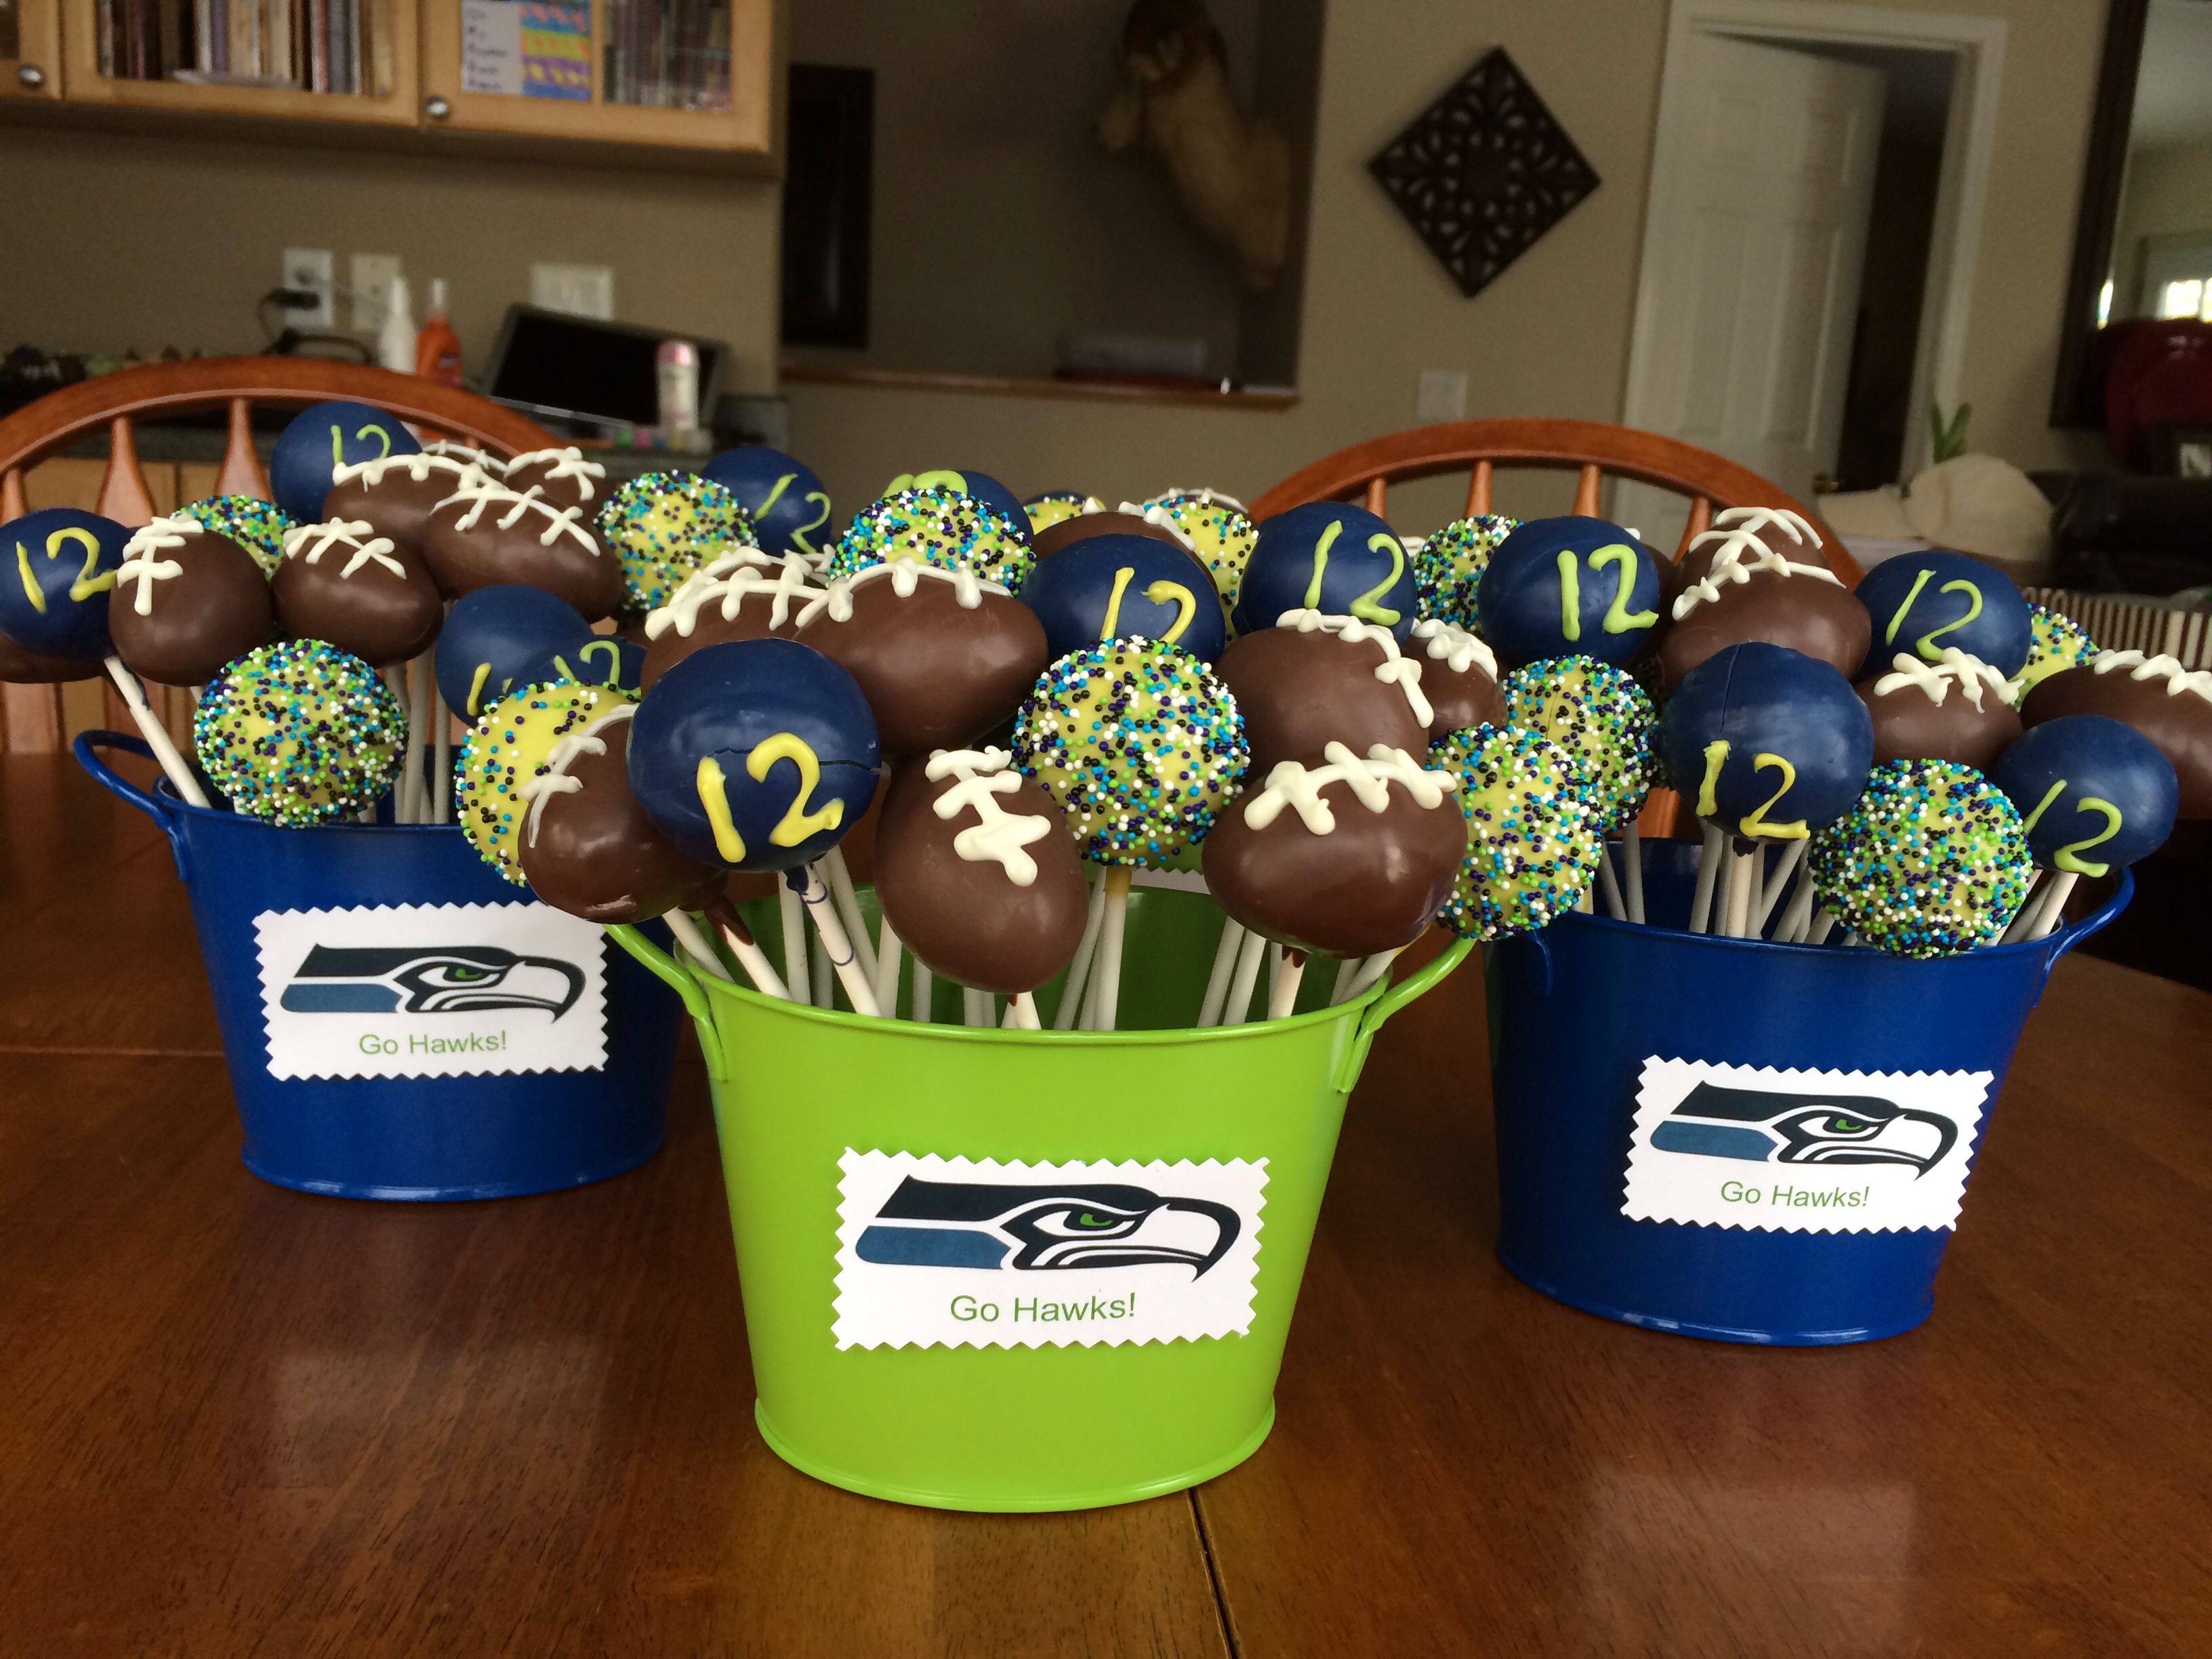 seahawk super bowl cake pops american football pinterest fu ball snacks snacks und fu ball. Black Bedroom Furniture Sets. Home Design Ideas